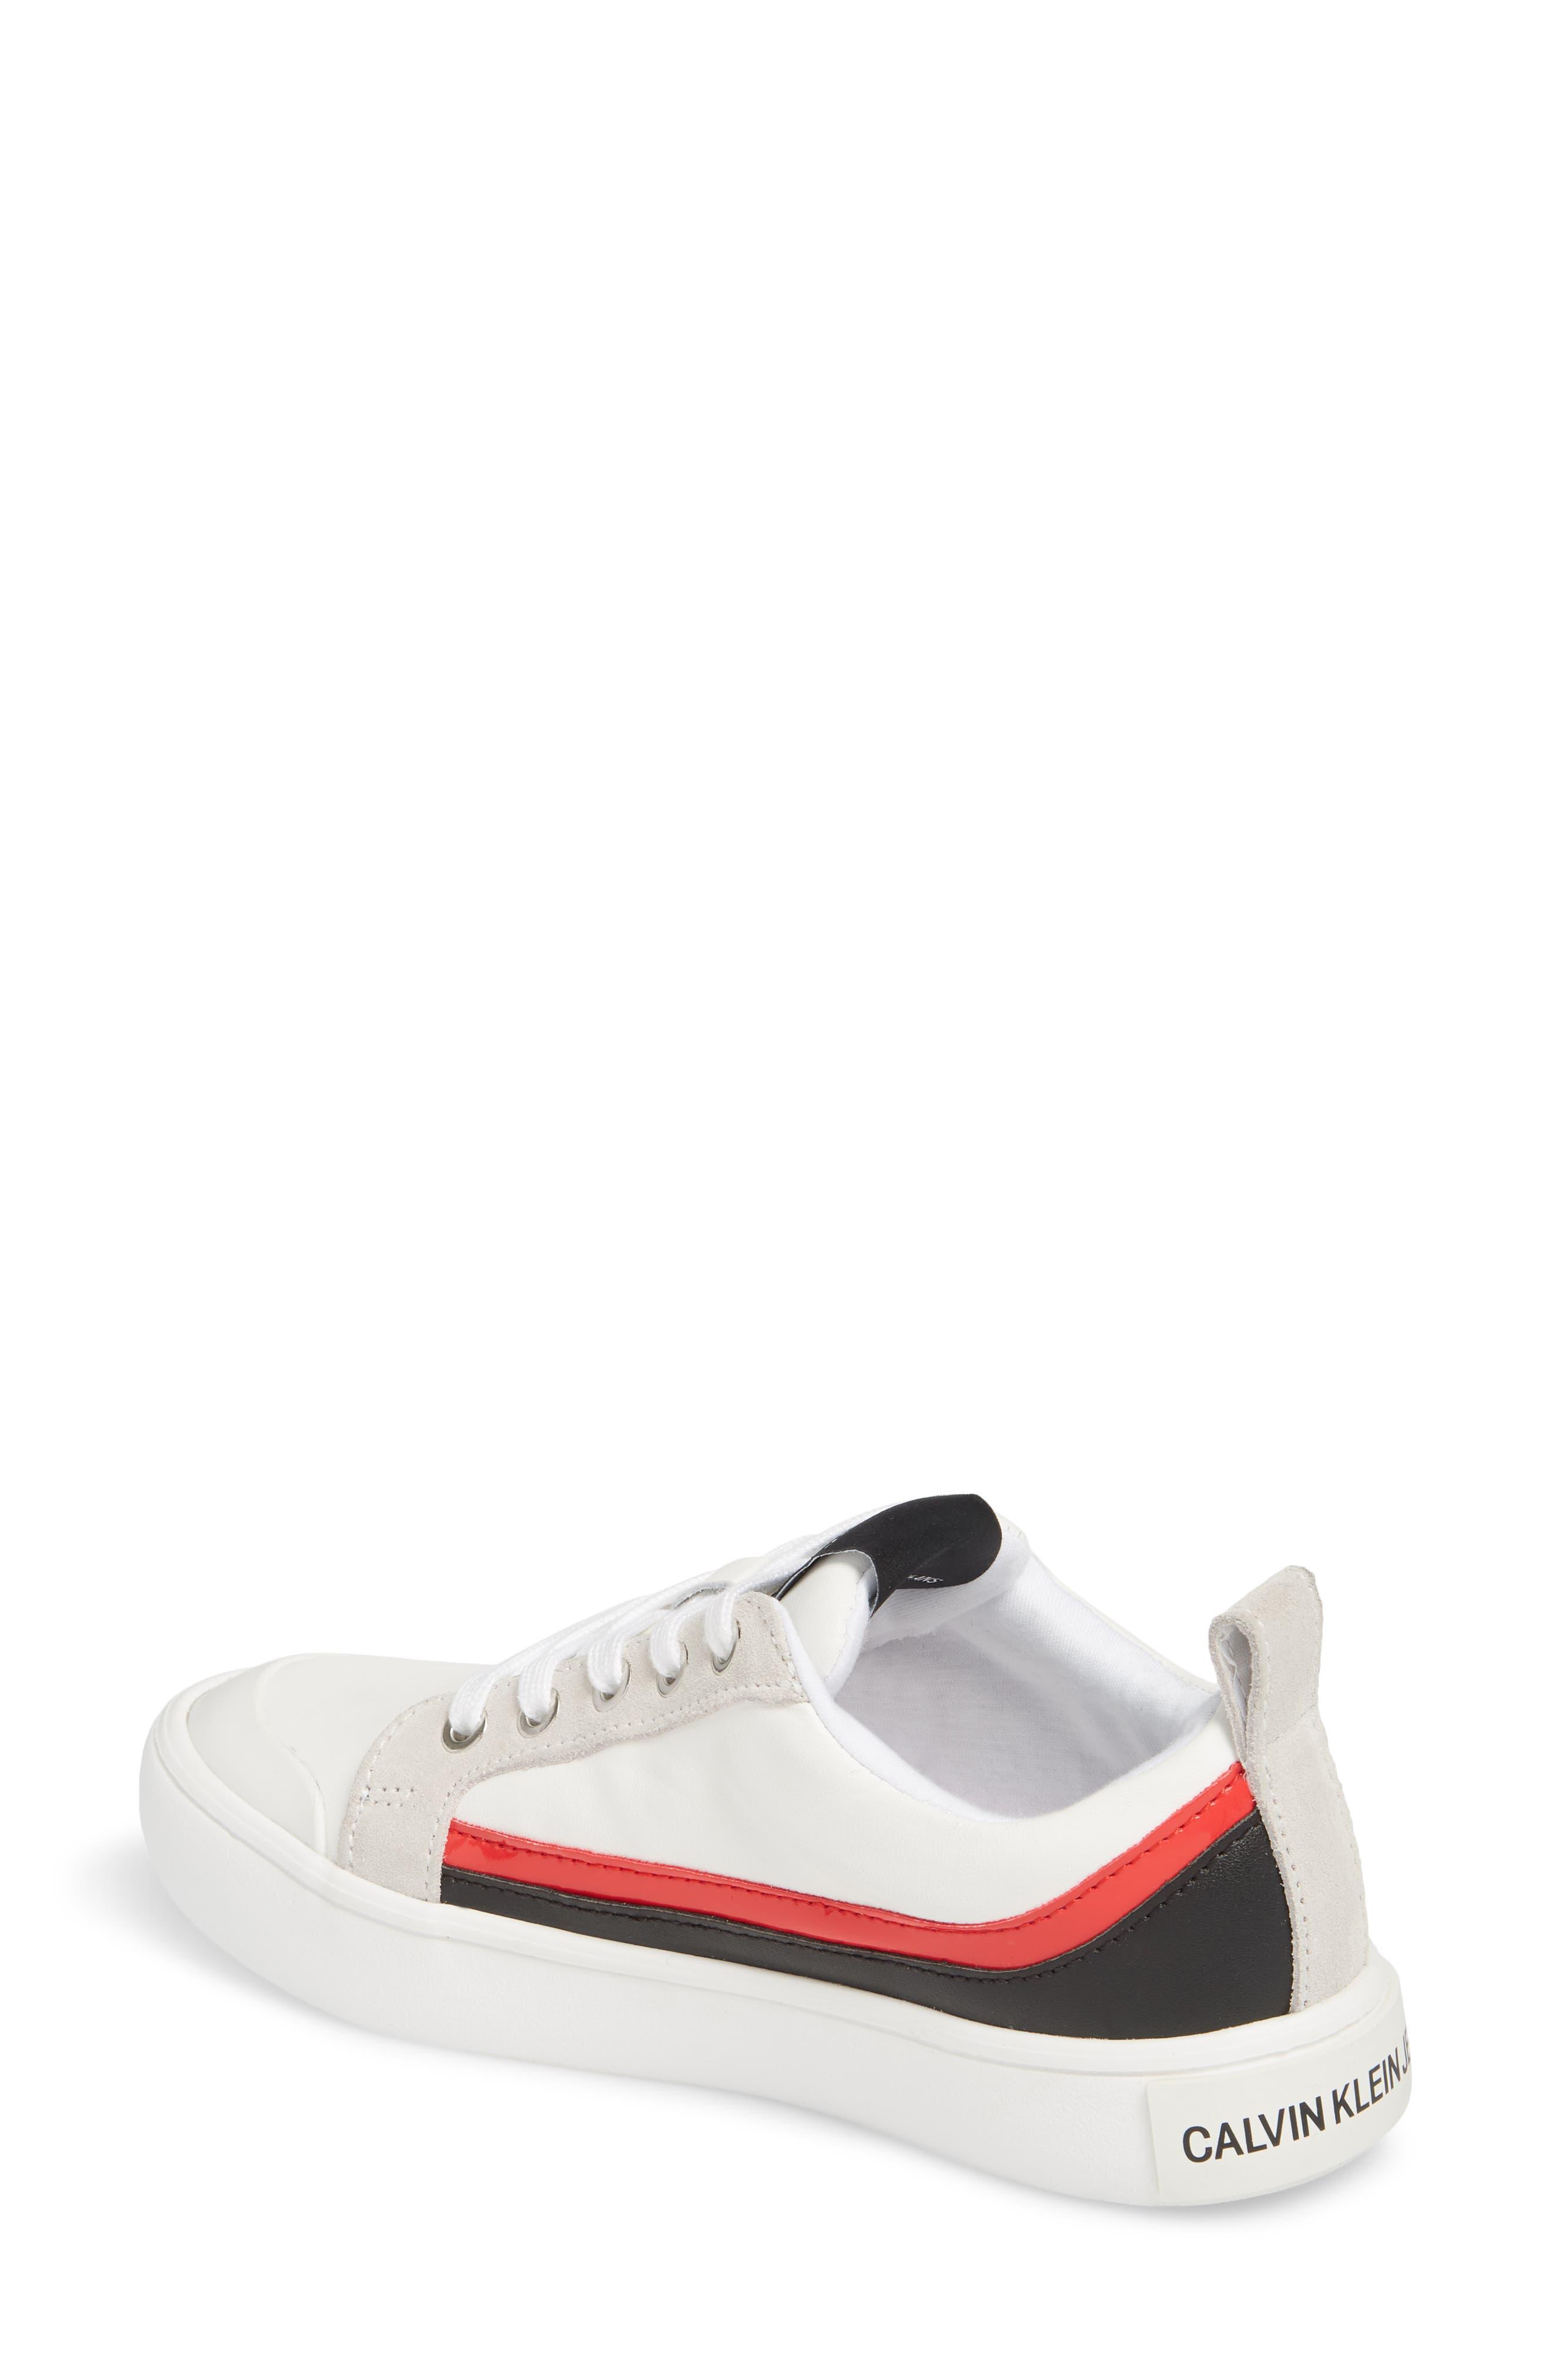 Dodie Sneaker,                             Alternate thumbnail 2, color,                             WHITE/ BLACK/ TOMATO